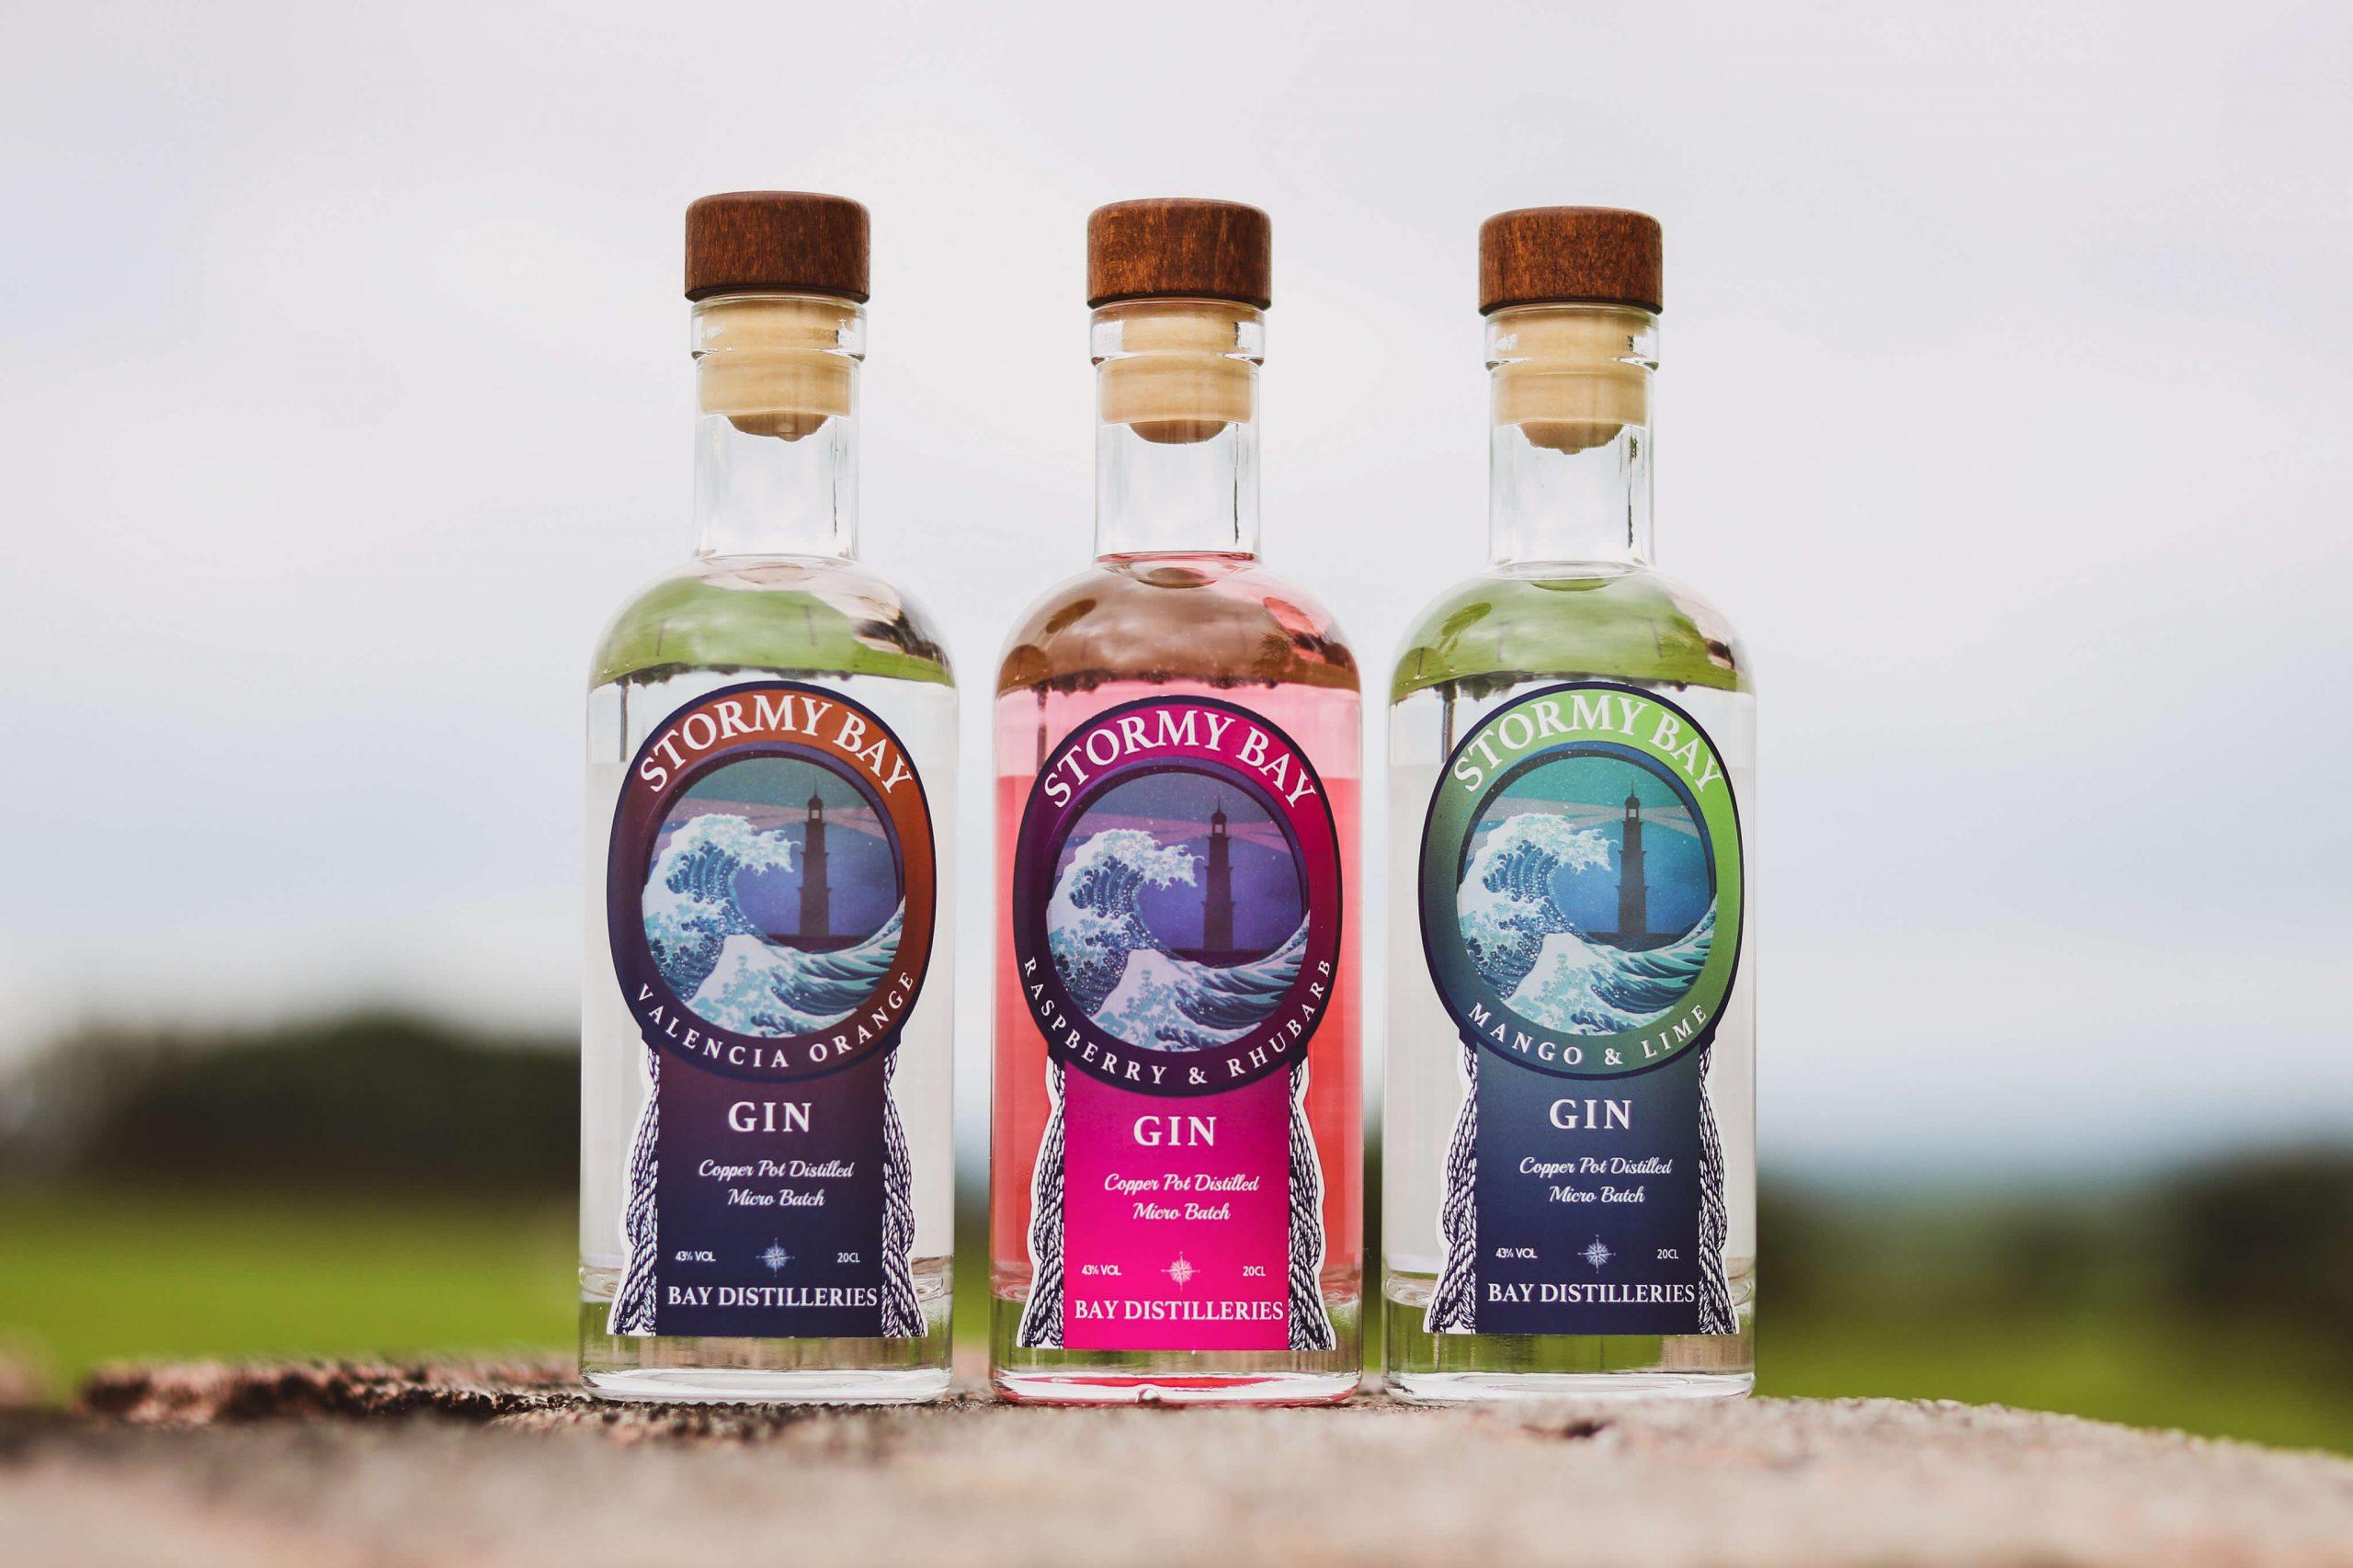 Stormy Bay gin